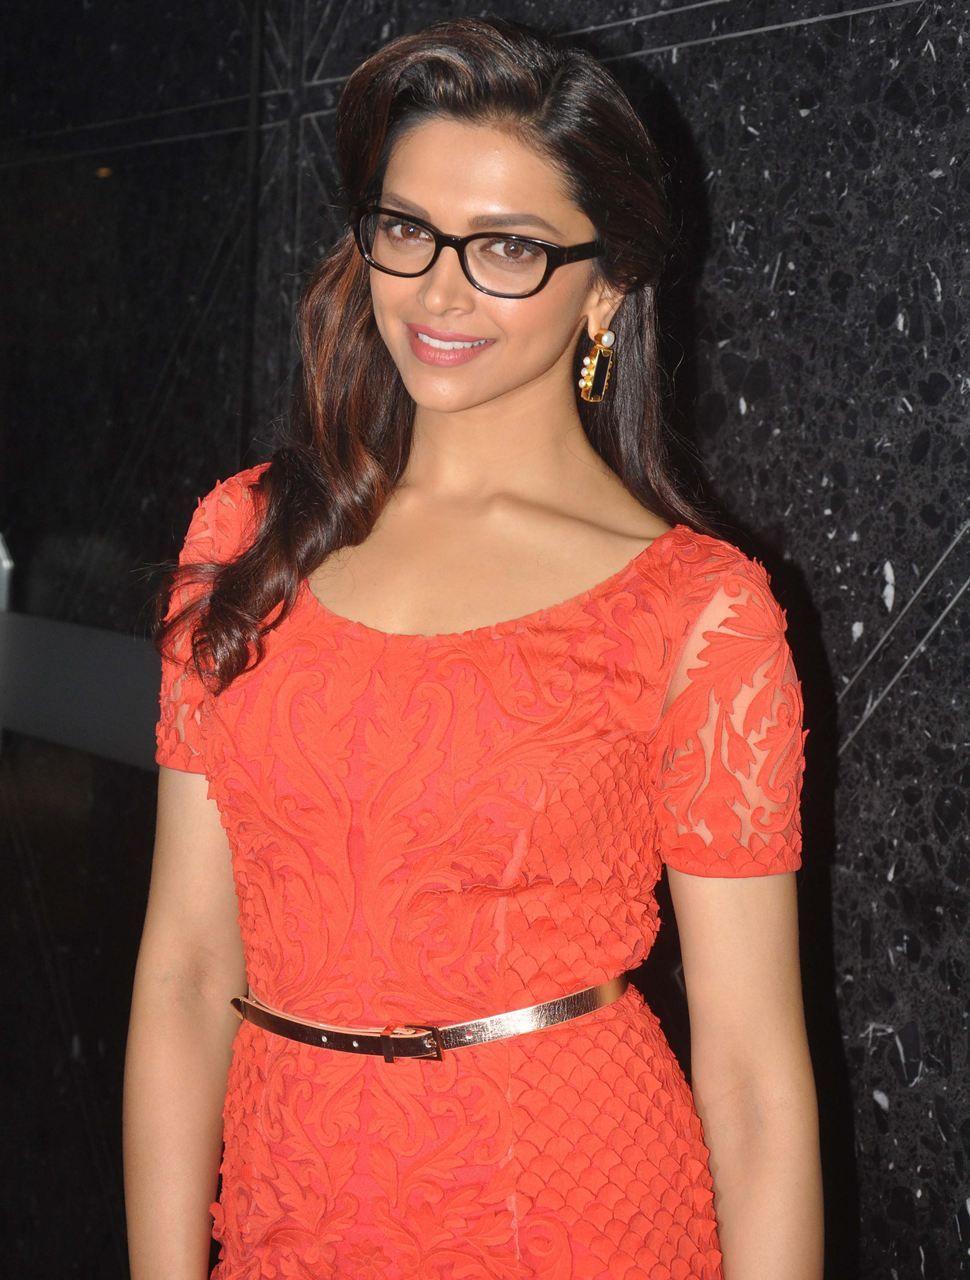 Glasses | Deepika padukone hot, Deepika padukone, Fashion